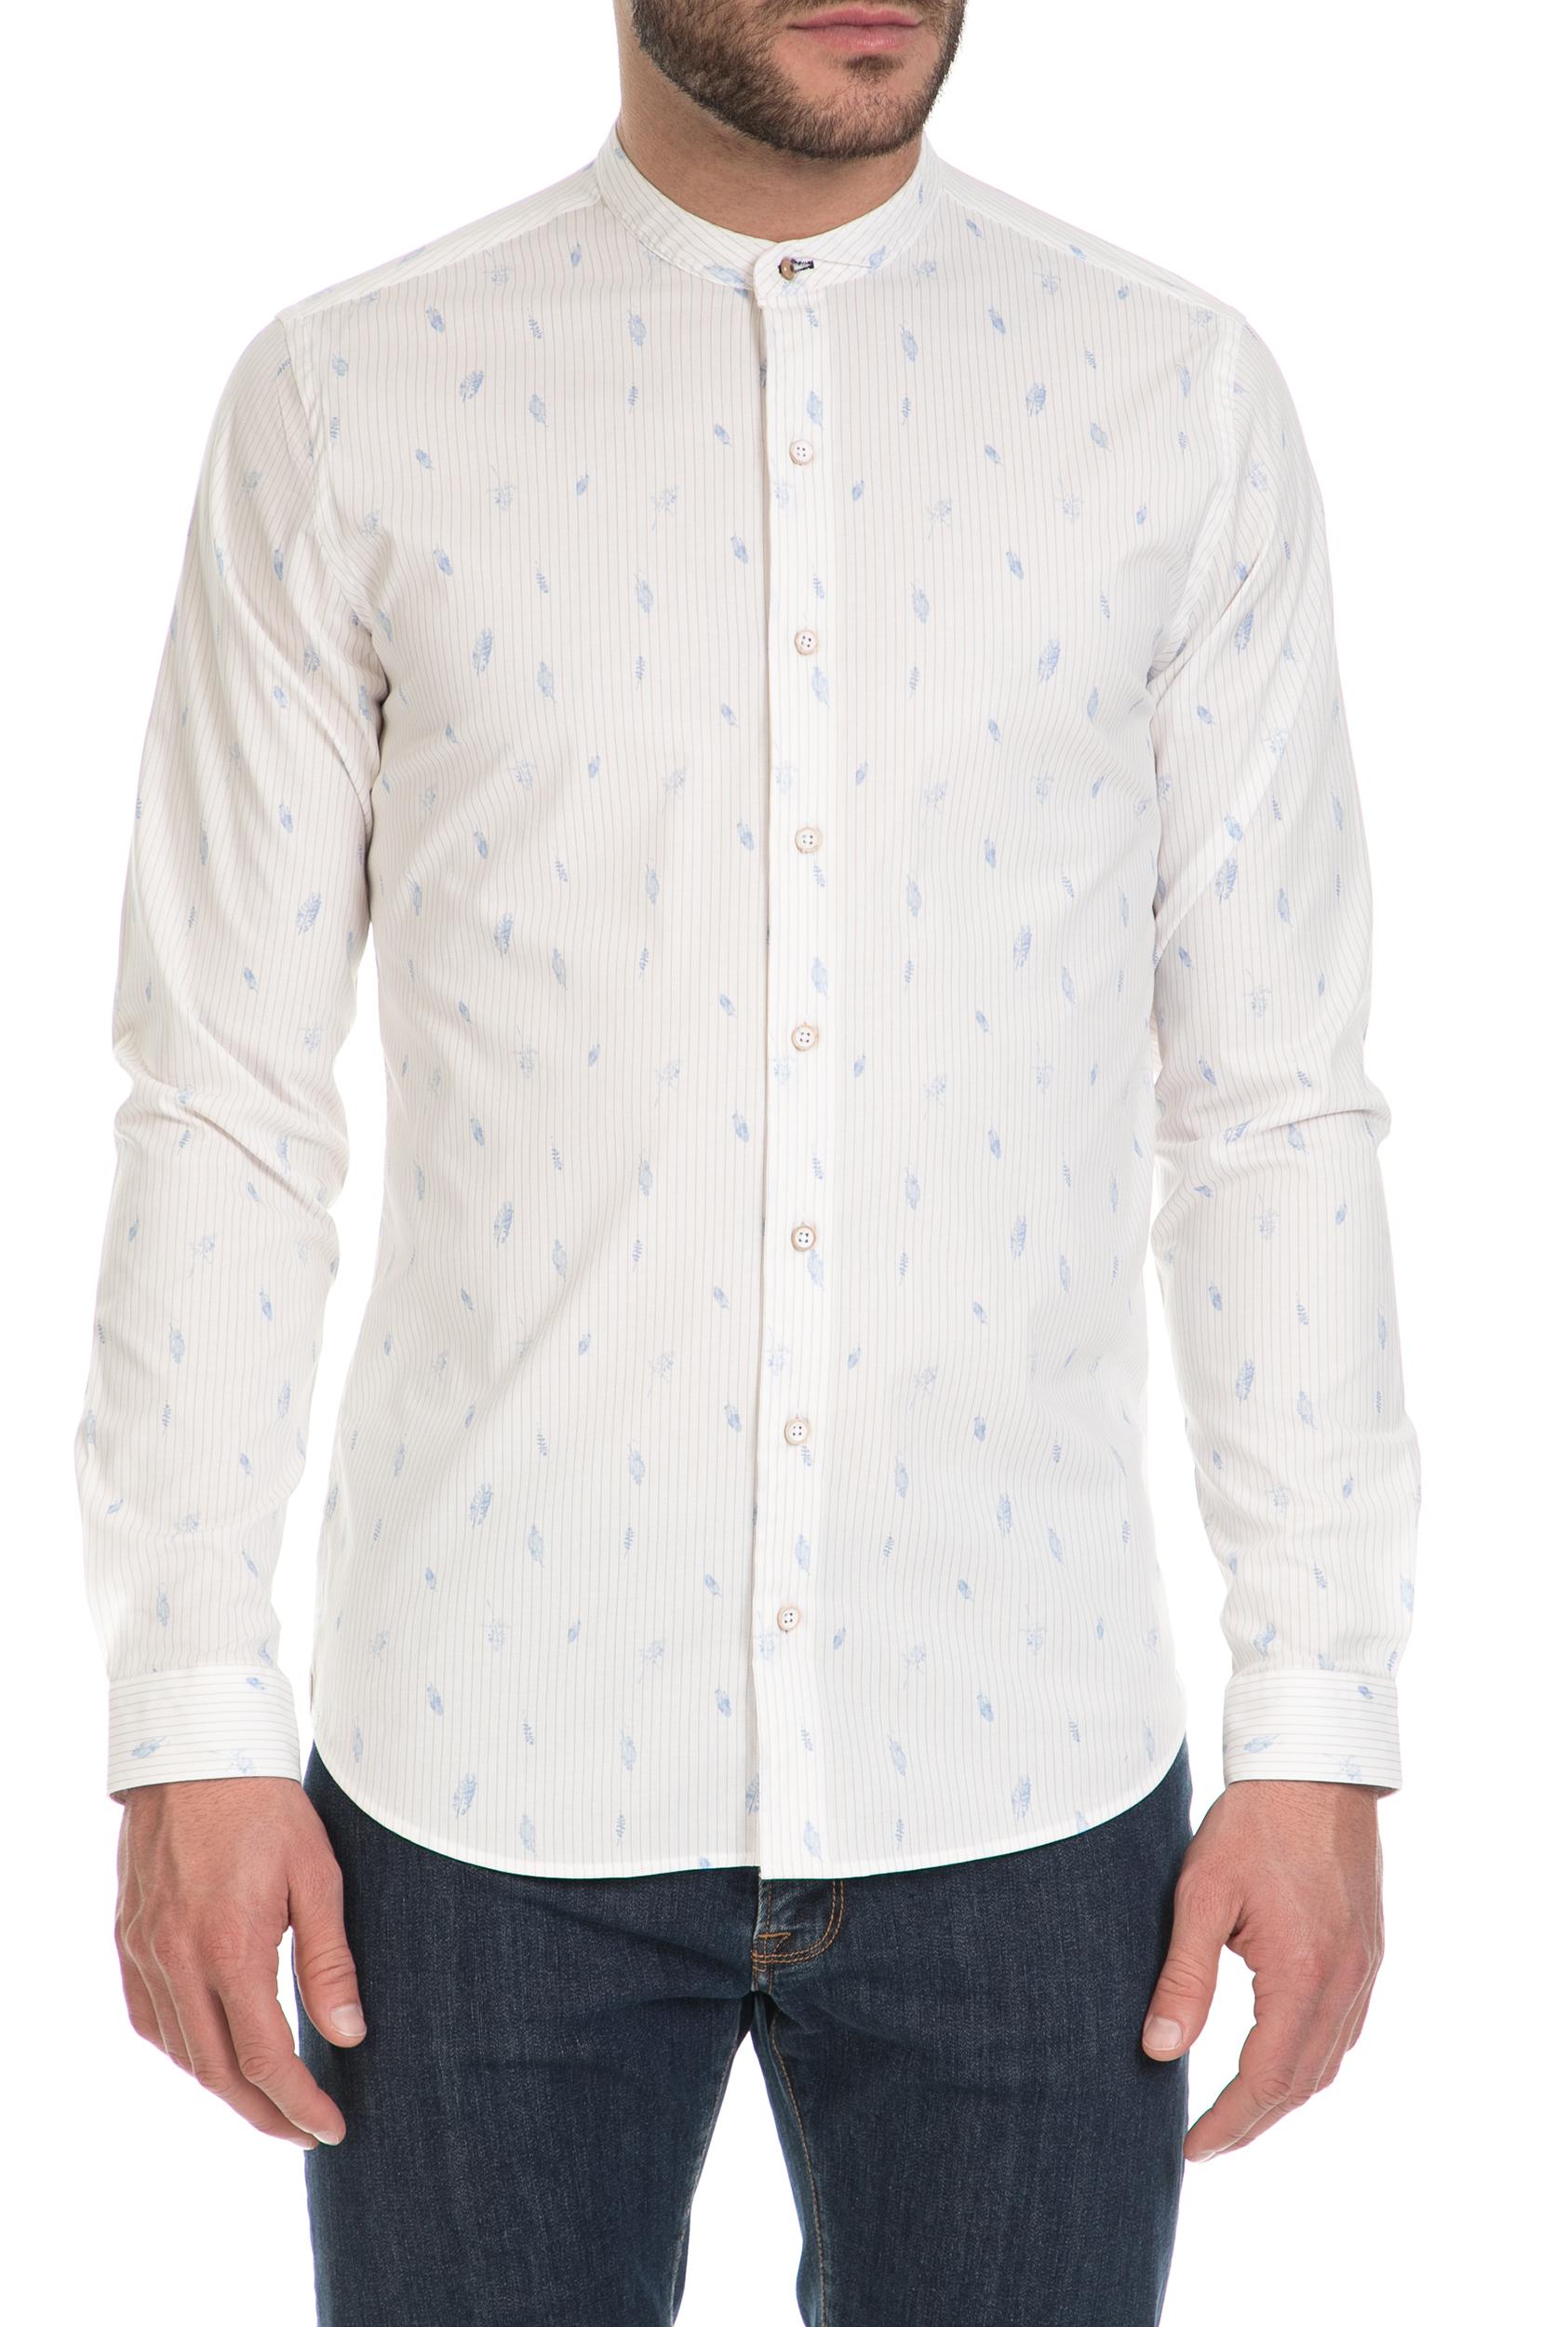 661d7c1dfb0 SSEINSE - Ανδρικό πουκάμισο COREANA SSEINSE λευκό